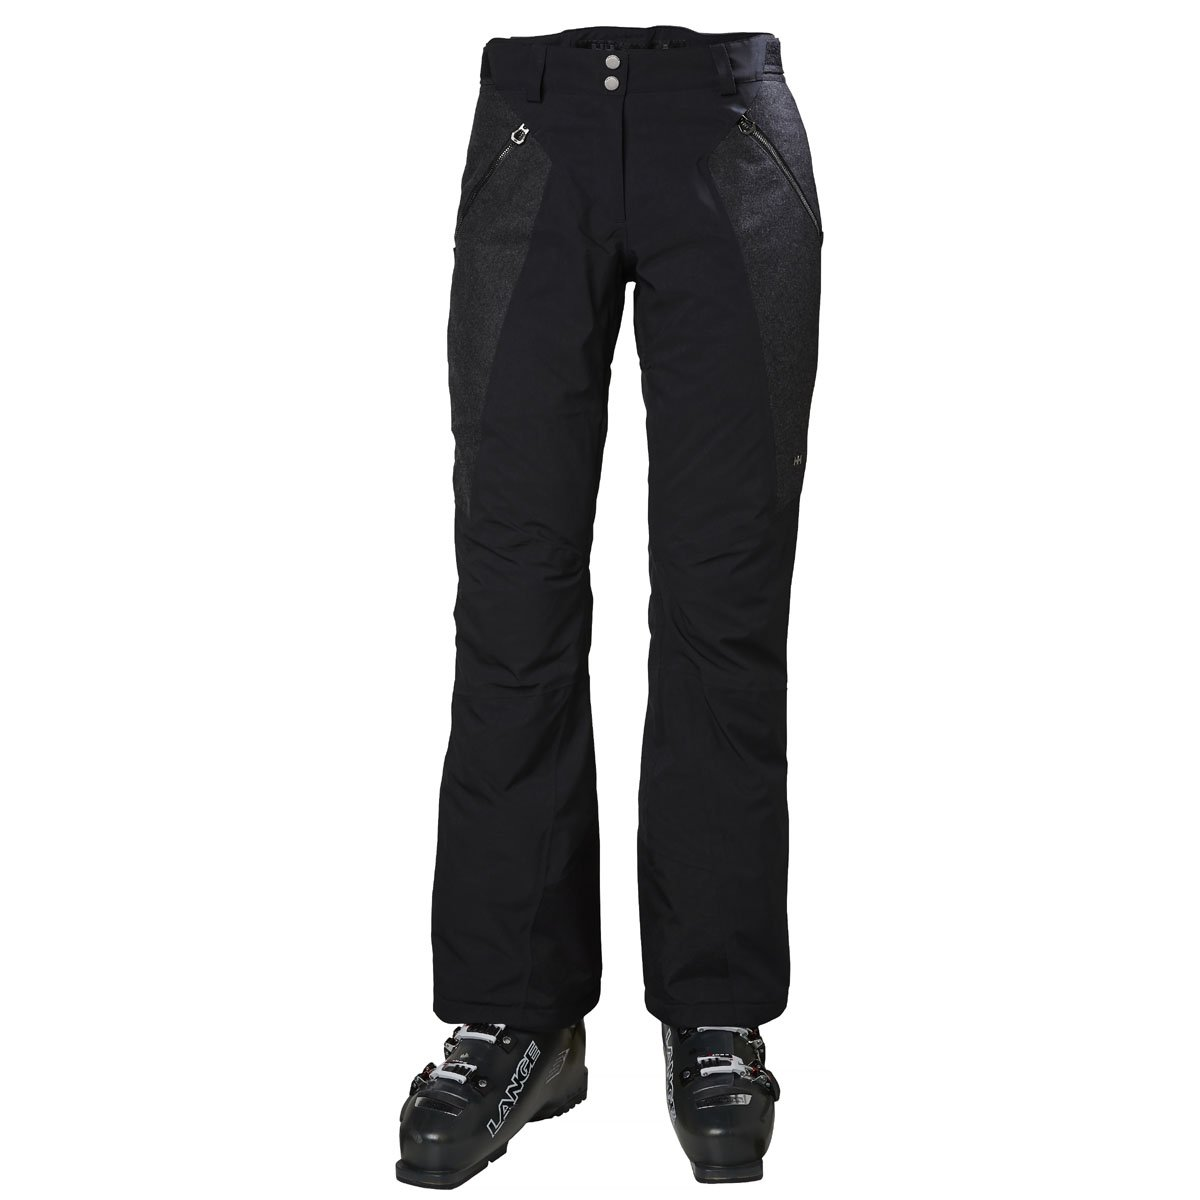 Helly Hansen 65631 Women's Cassady Pant, Black Wool - M